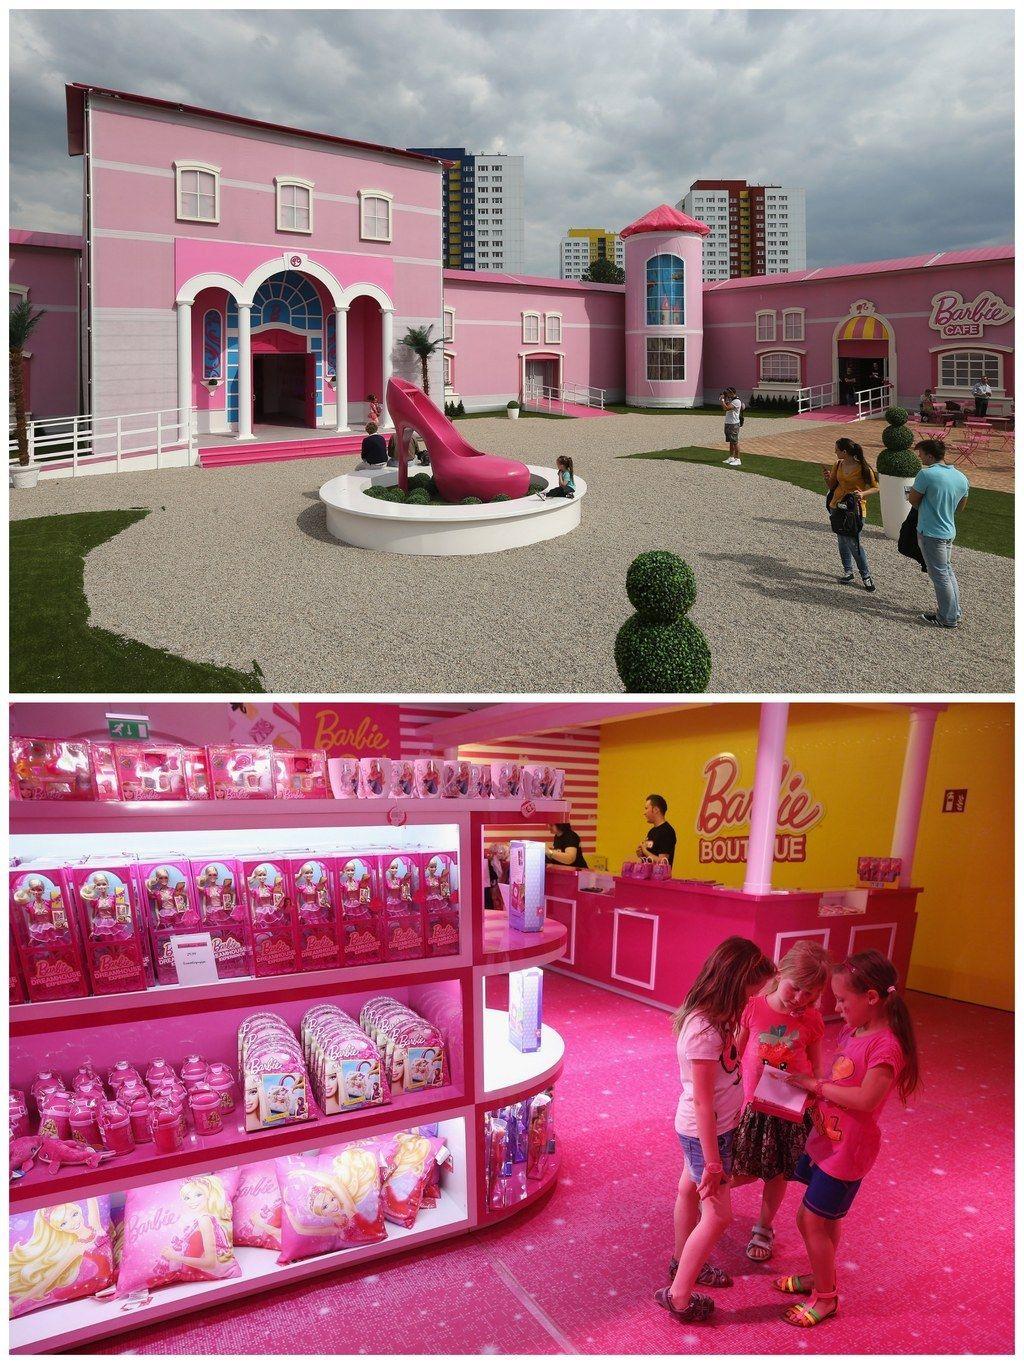 A Href Http Go Redirectingat Com Id 74679x1524629 Sref Https 3a 2f 2fwww Buzzfeed Com 2fmikesp Barbie Dream House Barbie Dreamhouse Experience Barbie Dream